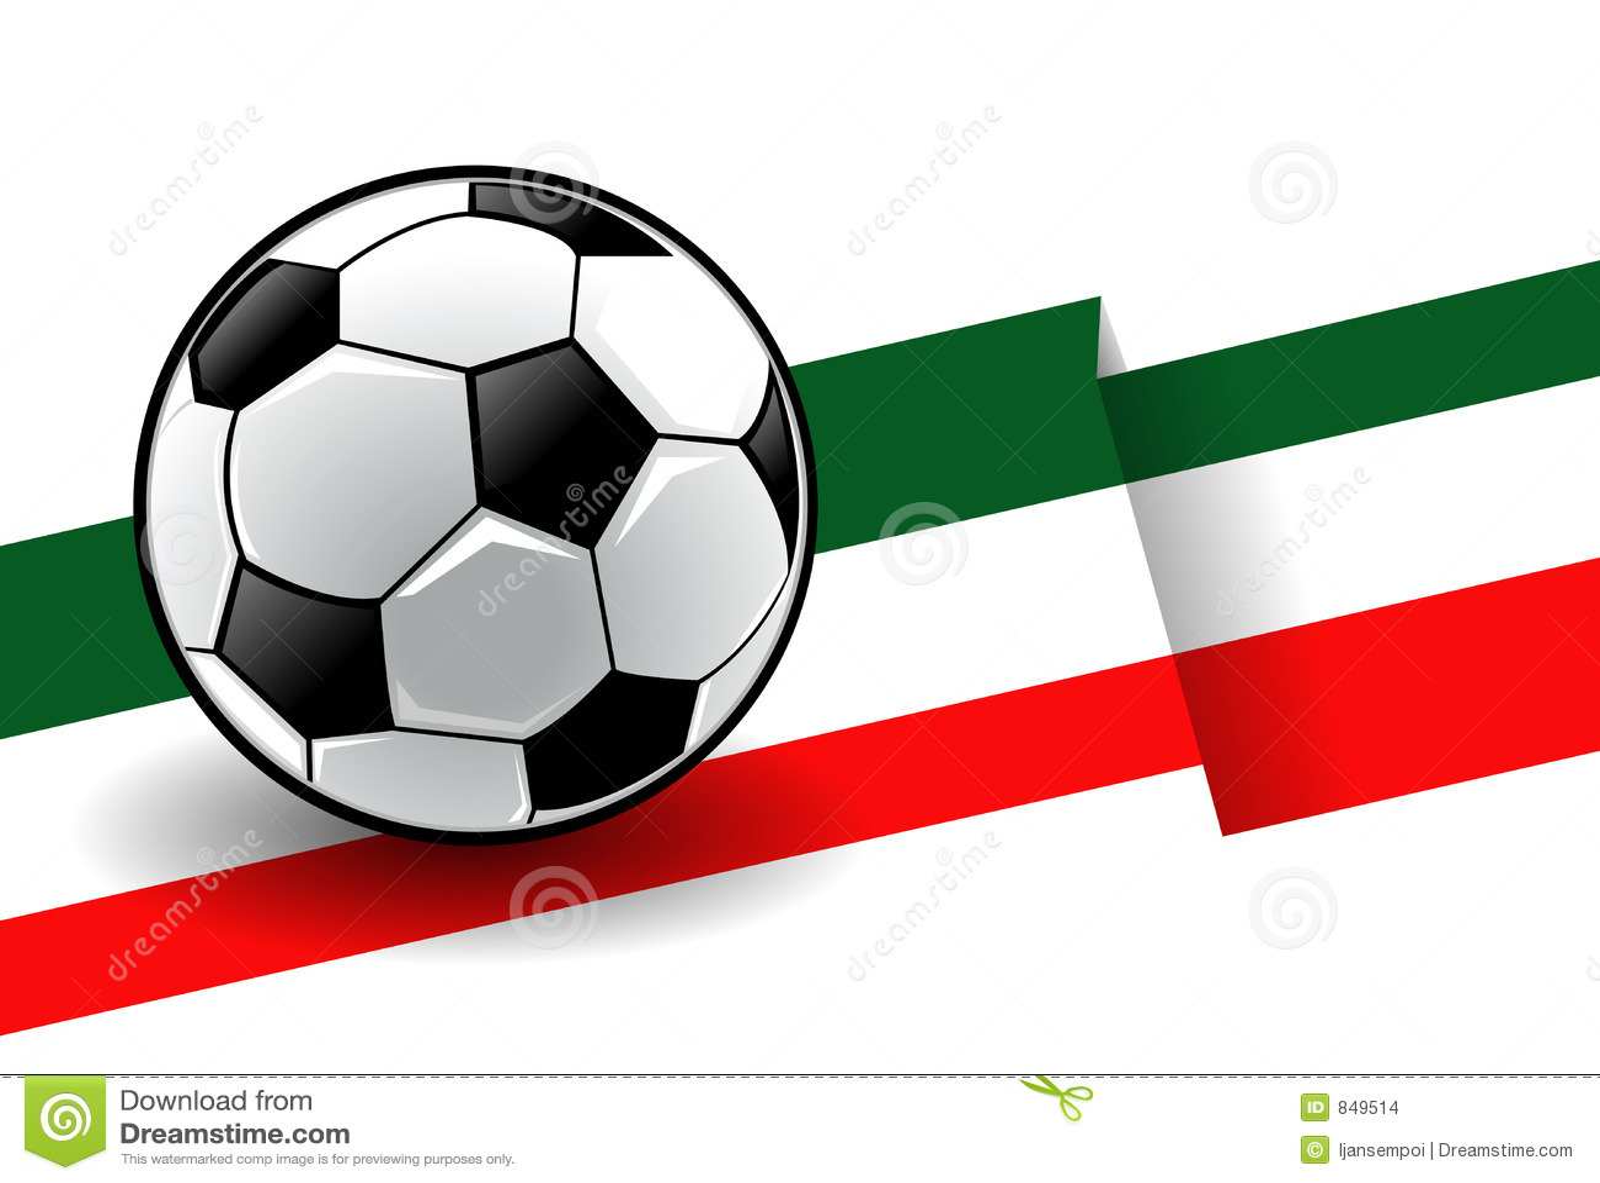 Football with flag - Italy